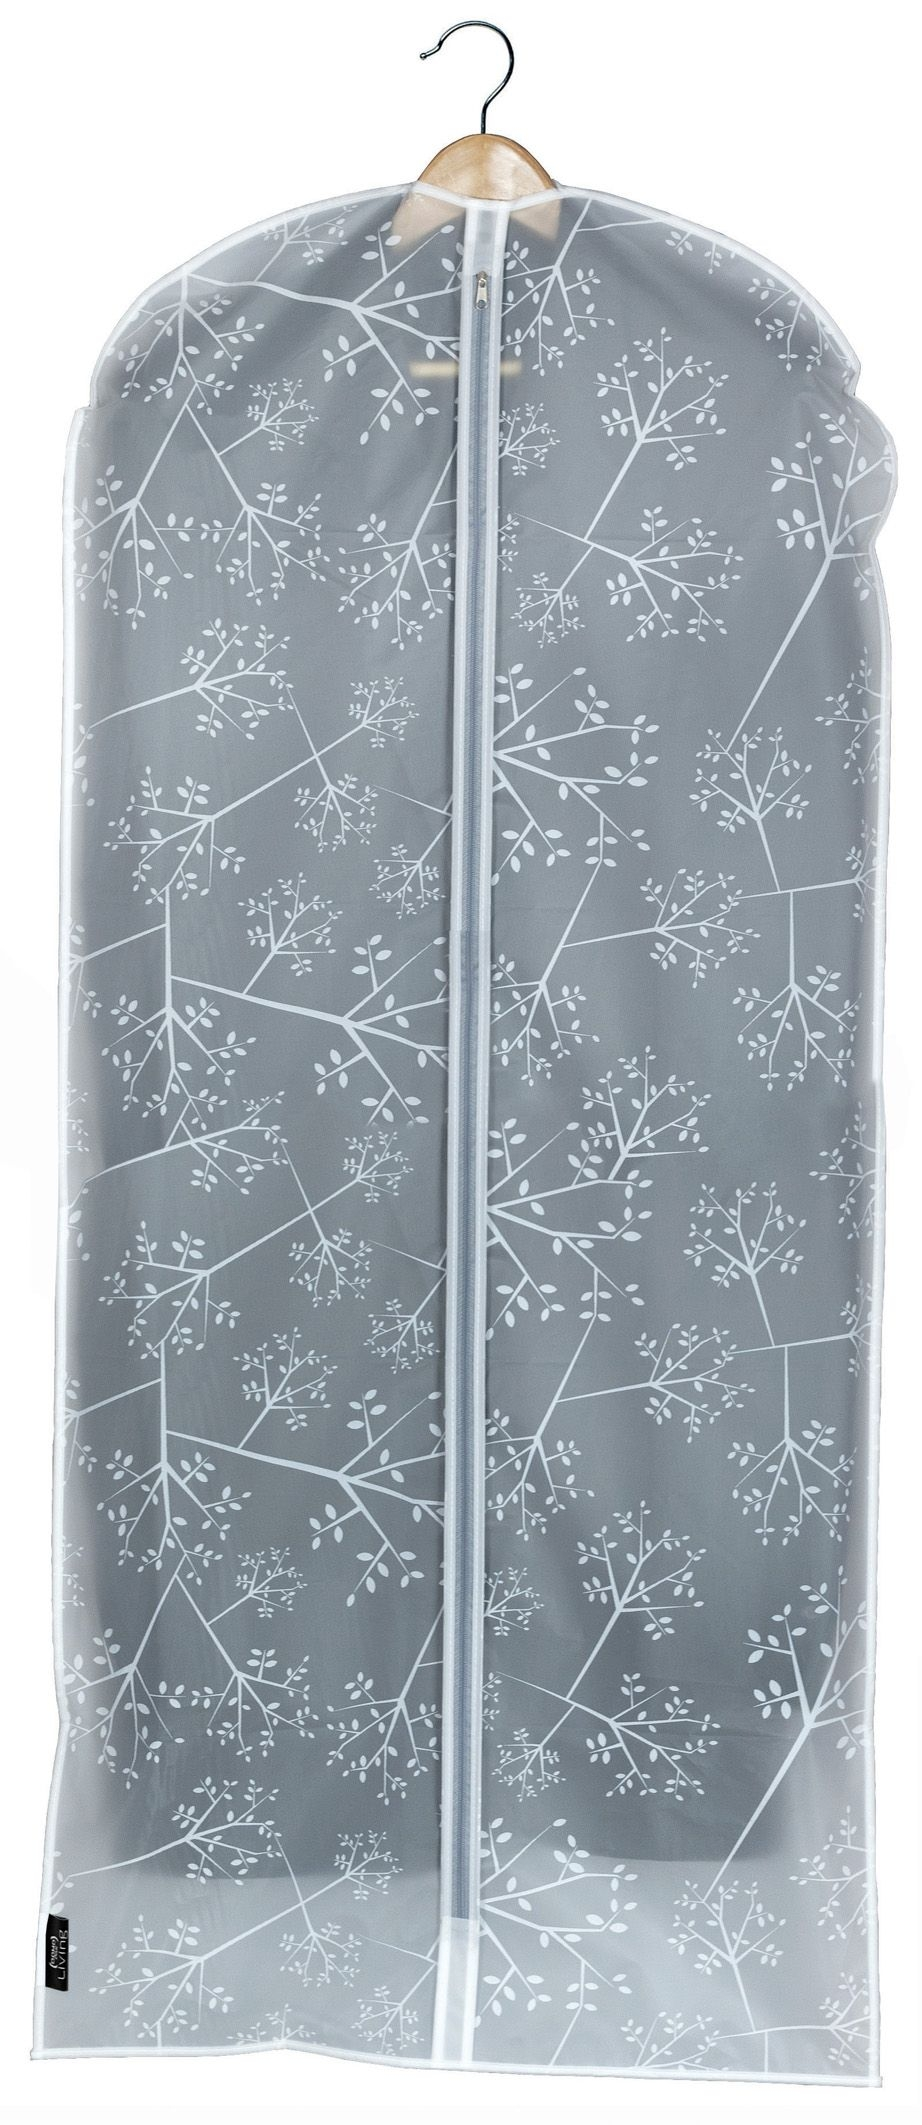 Husa pentru haine cu fermoar, Bon Ton Transparent / Alb, l60xH135 cm imagine